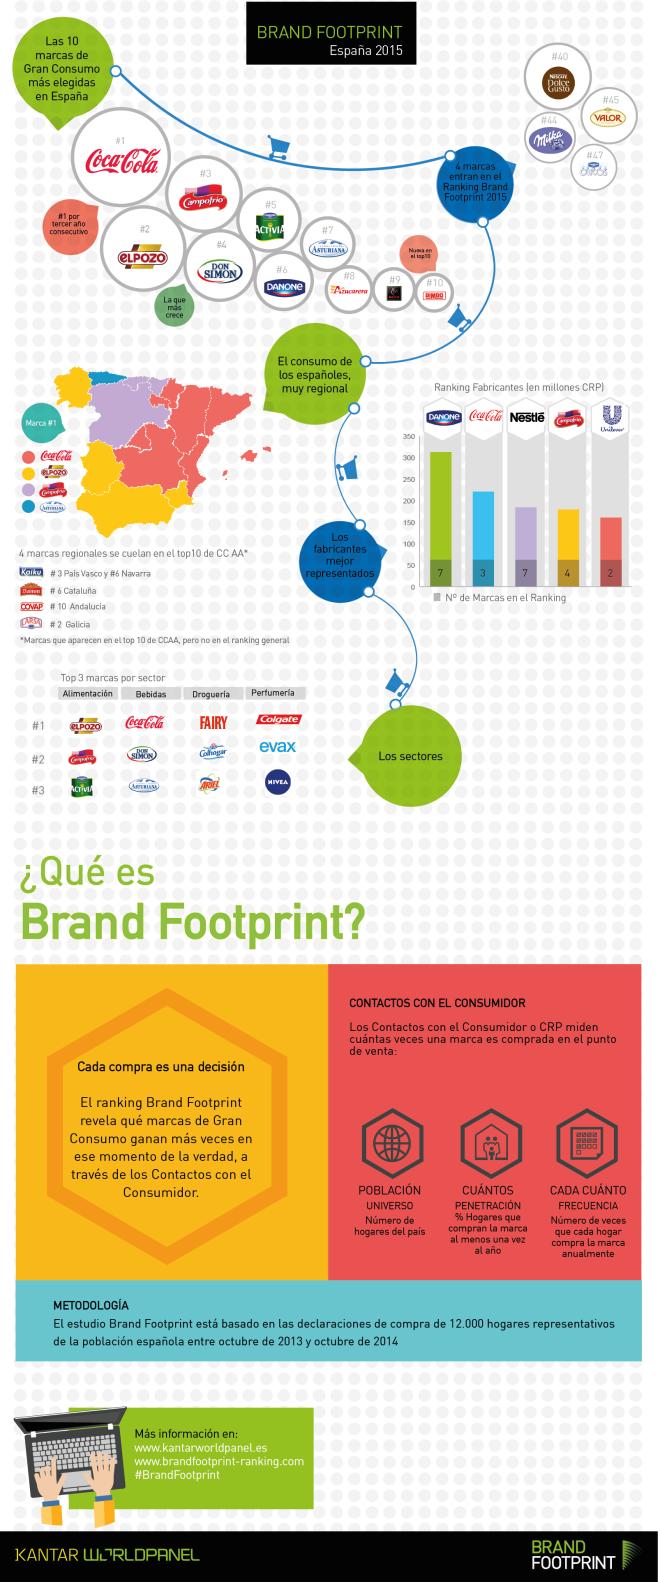 Brand FootPrint España 2015